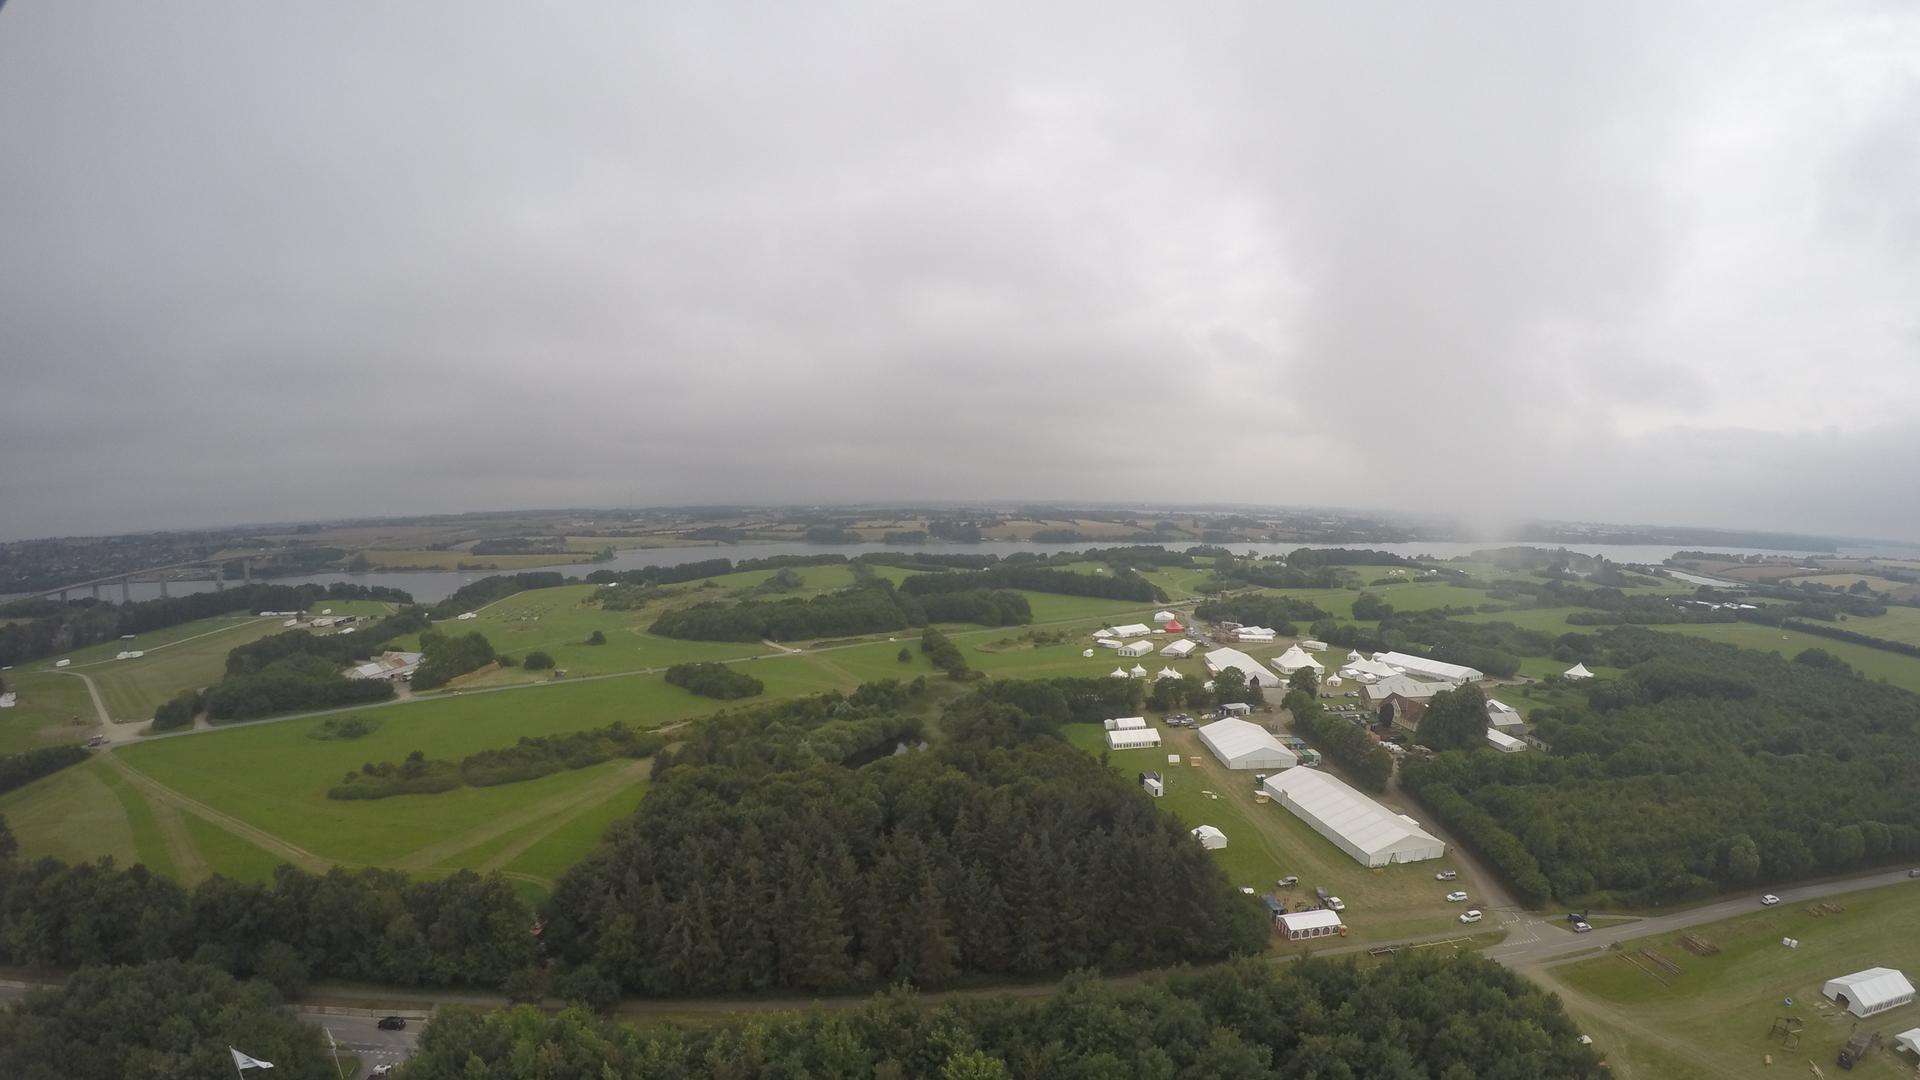 Livebillede Sønderborg